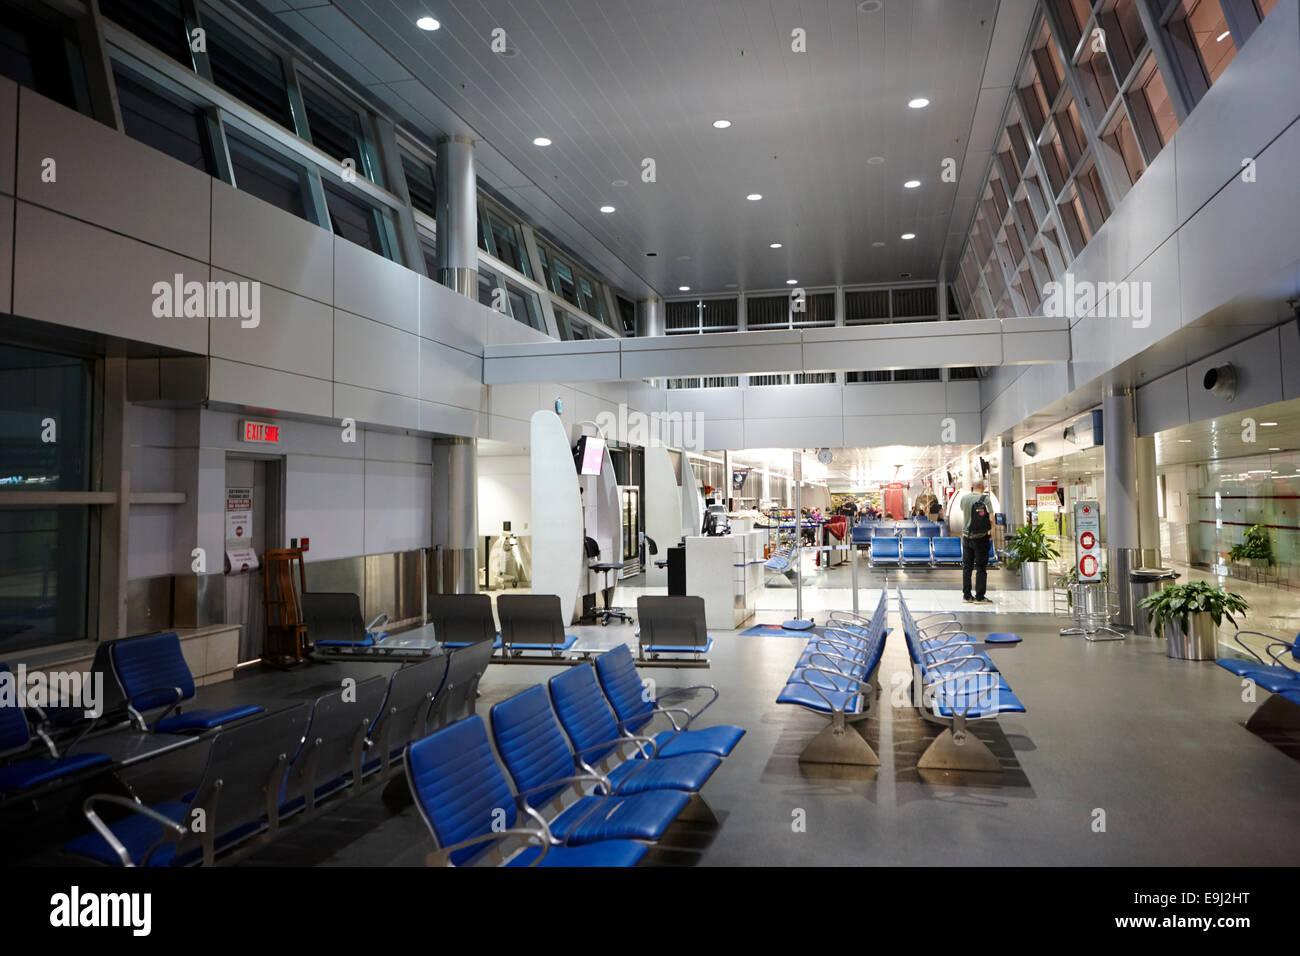 departure lounge of st john's international airport newfoundland Canada - Stock Image